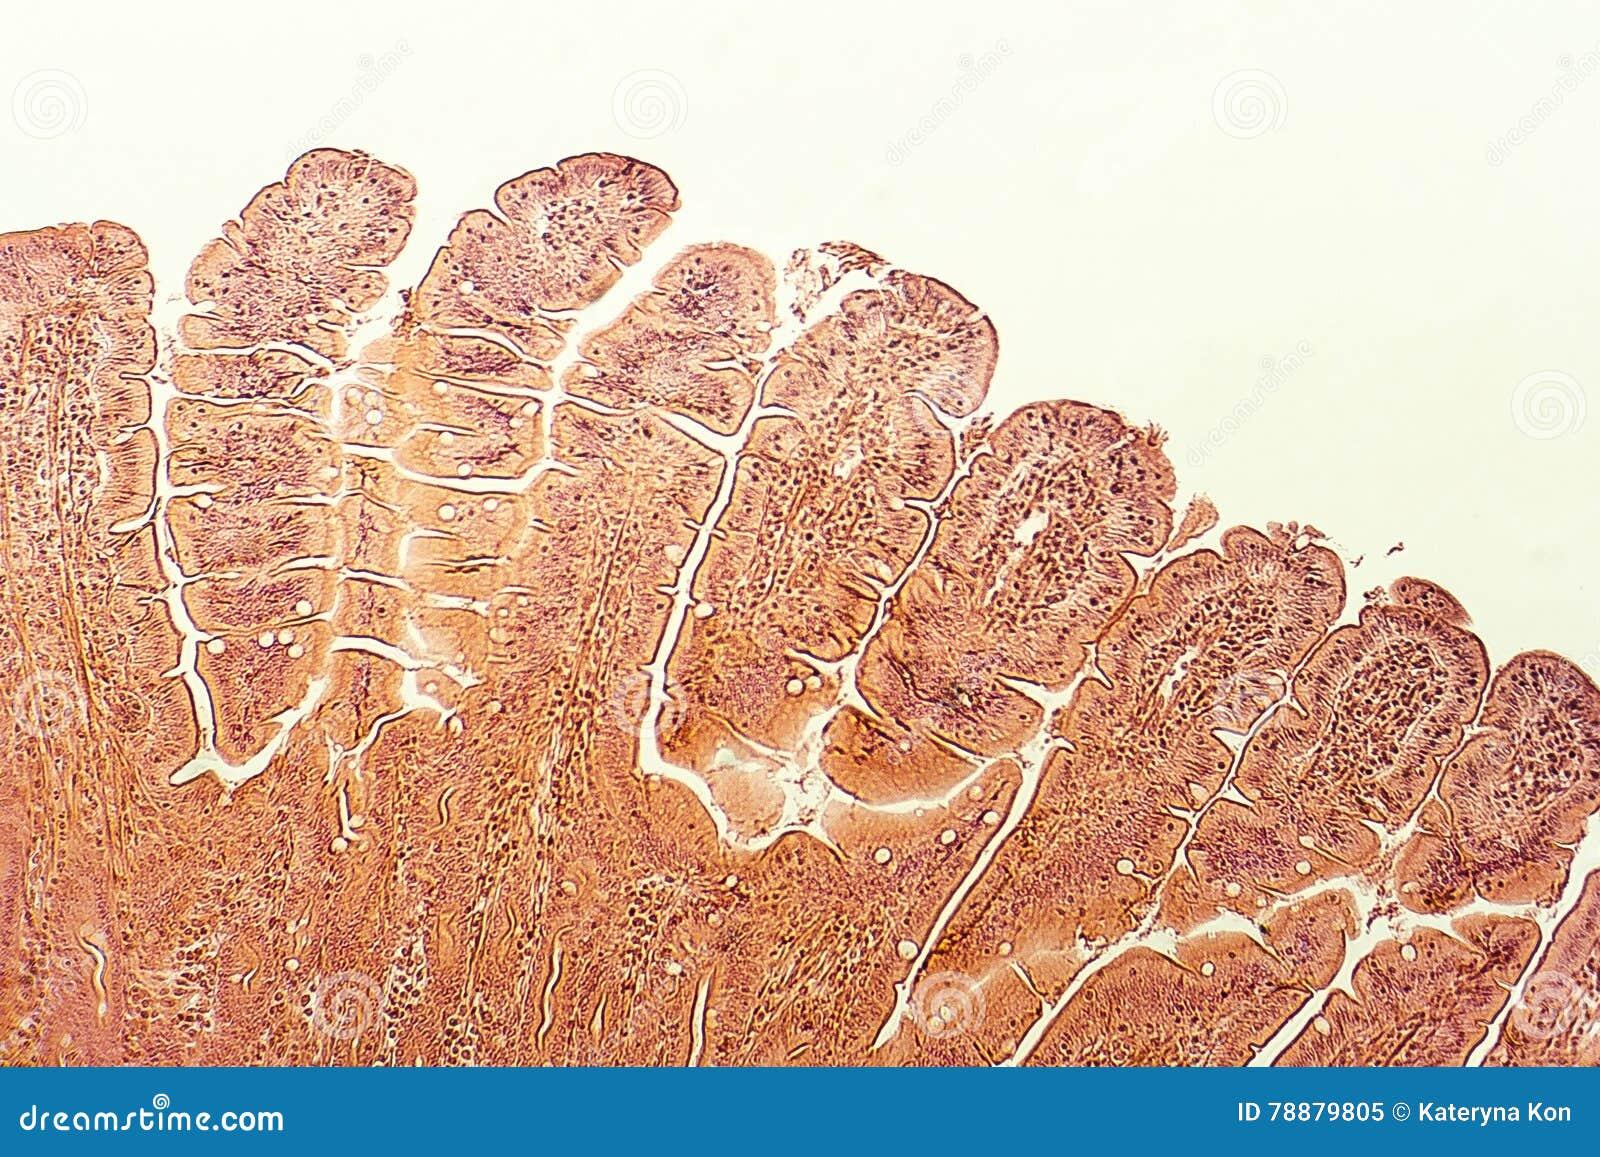 Villi Of Small Intestine Stock Image Image Of Micro 78879805